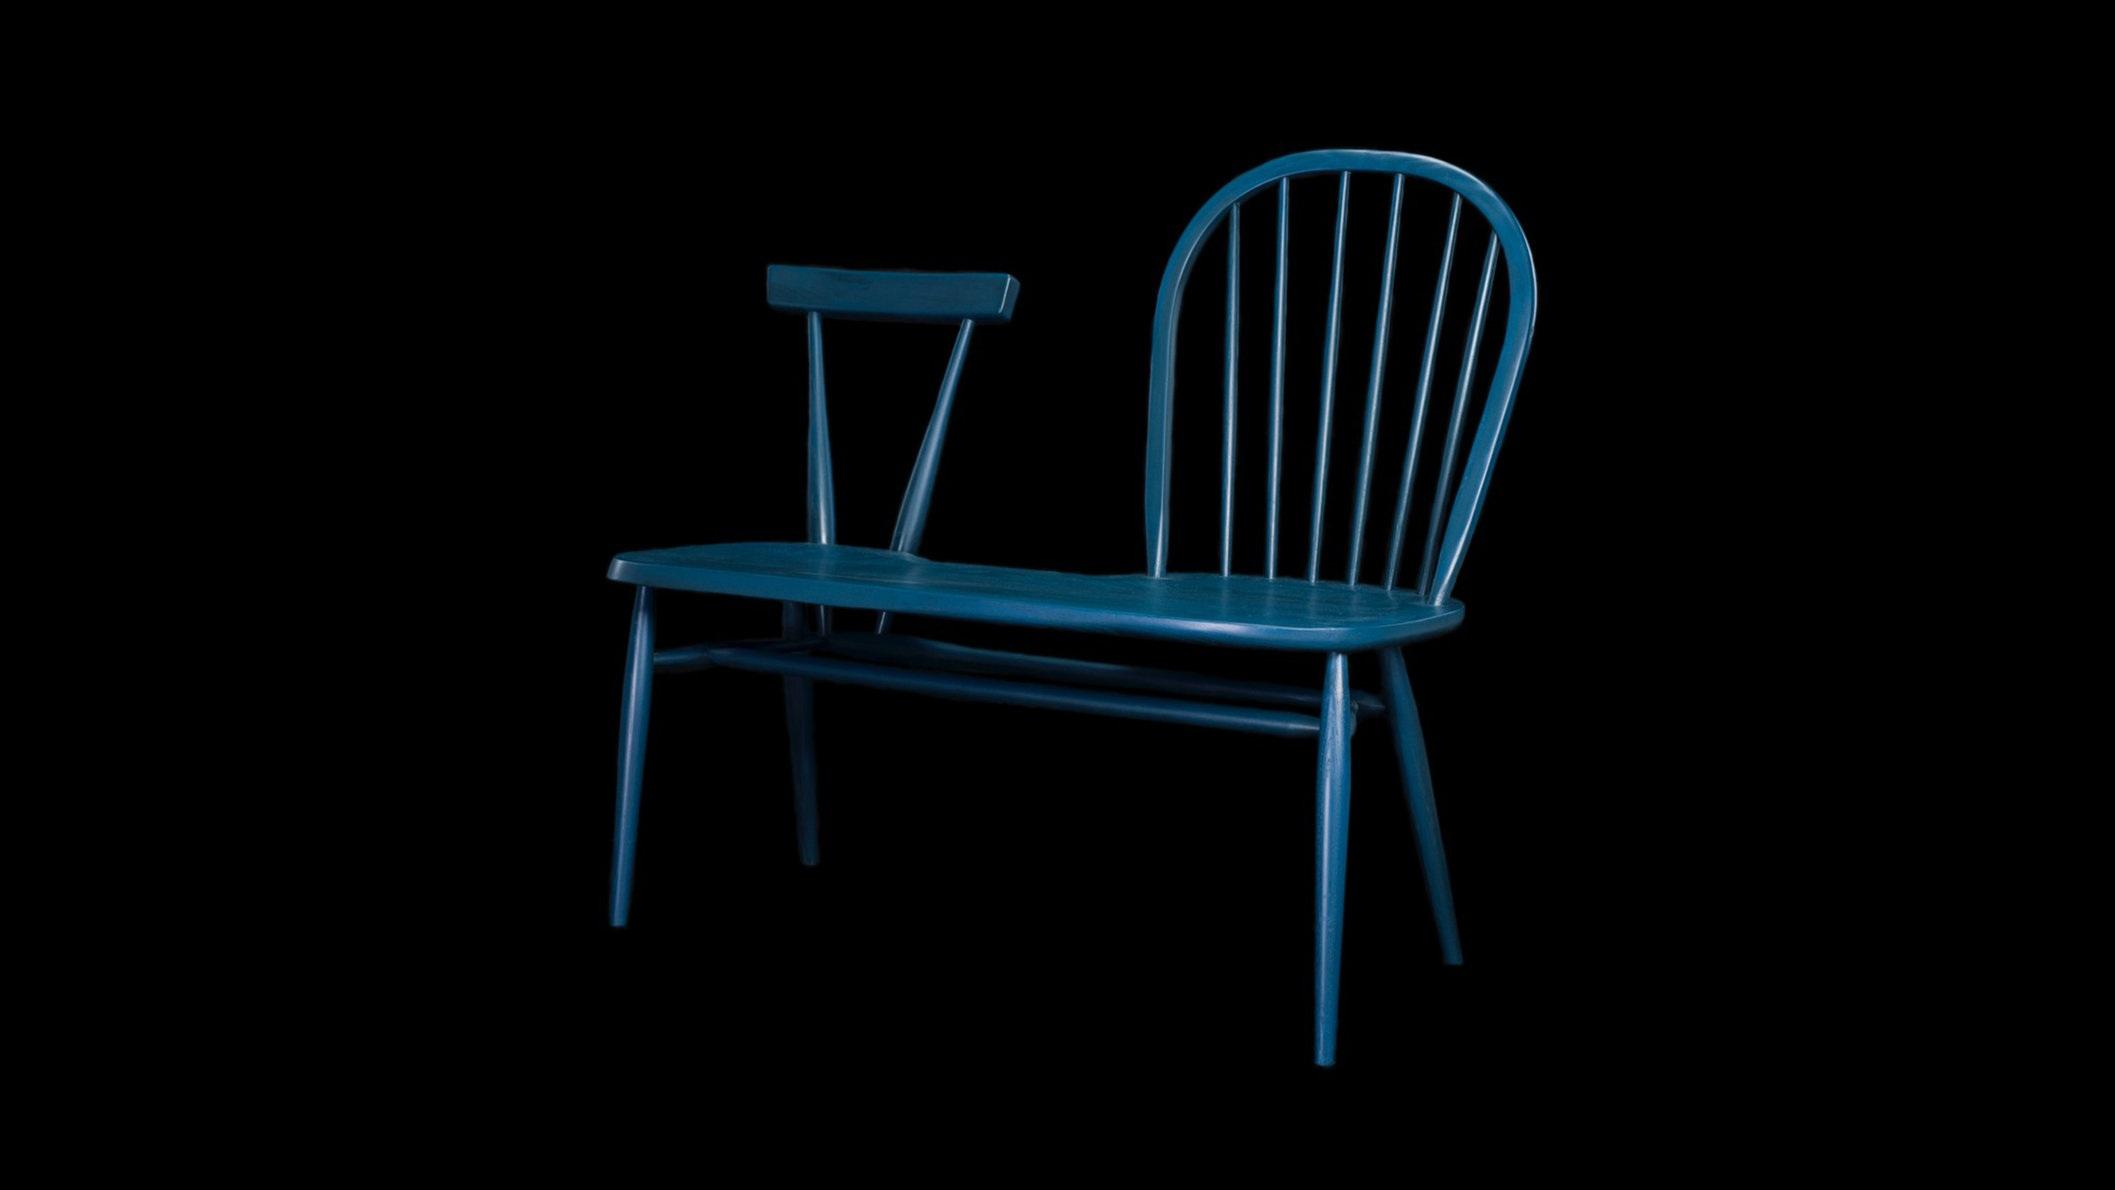 James-Plant-Design-Studio-Odd-Couples-Bench-blue.jpg